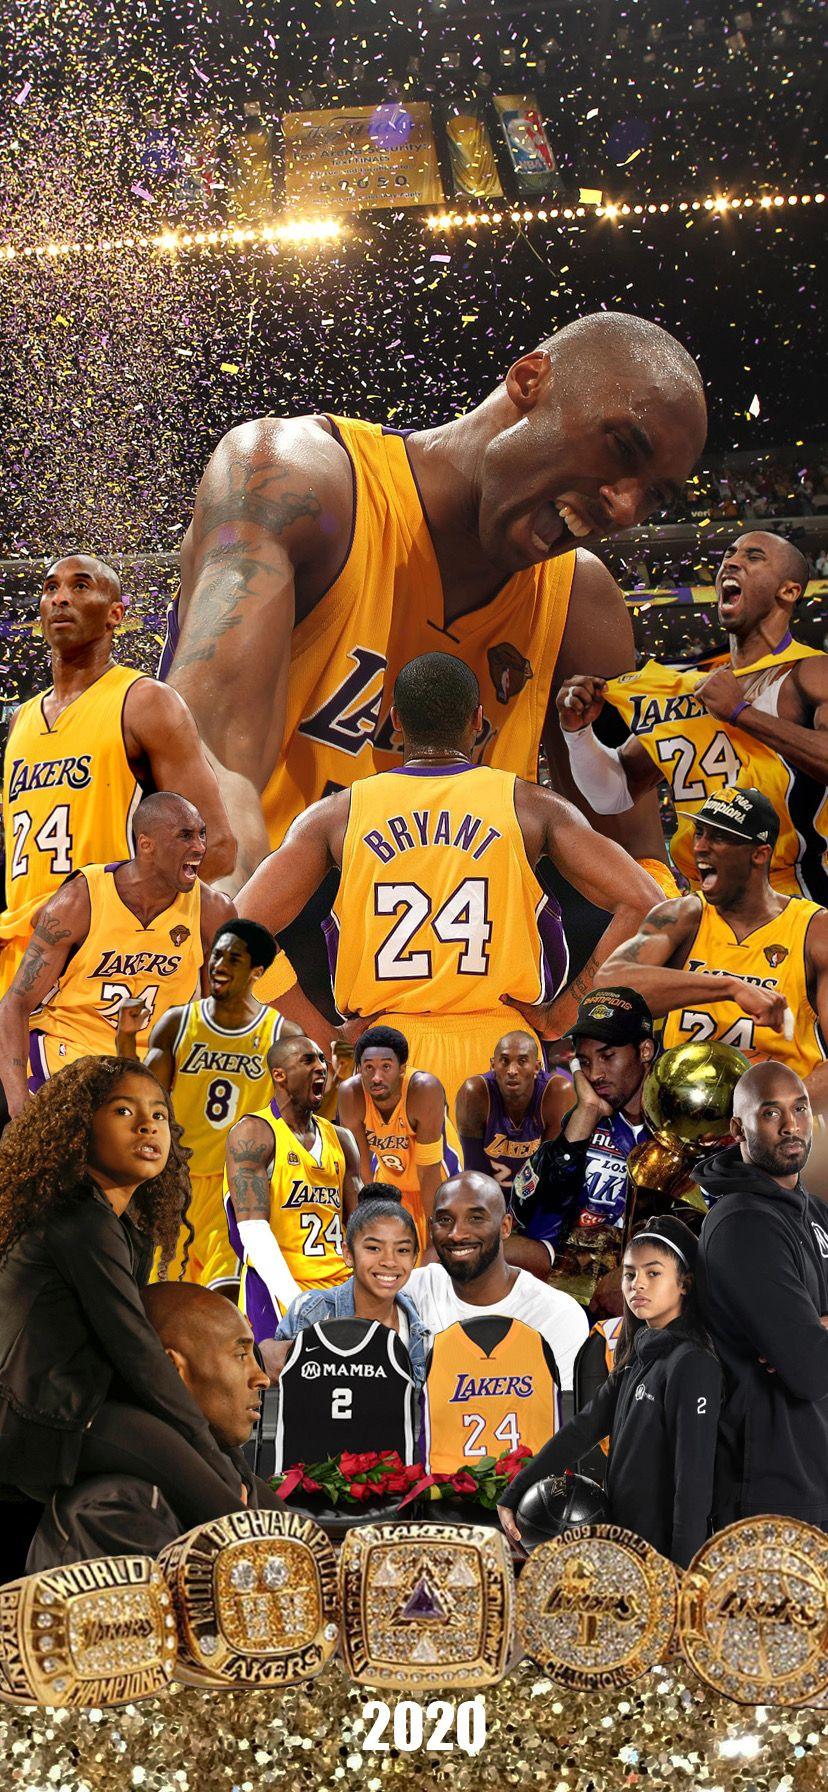 The Bryant S Memorial Wallpaper In 2020 Kobe Bryant Wallpaper Kobe Bryant